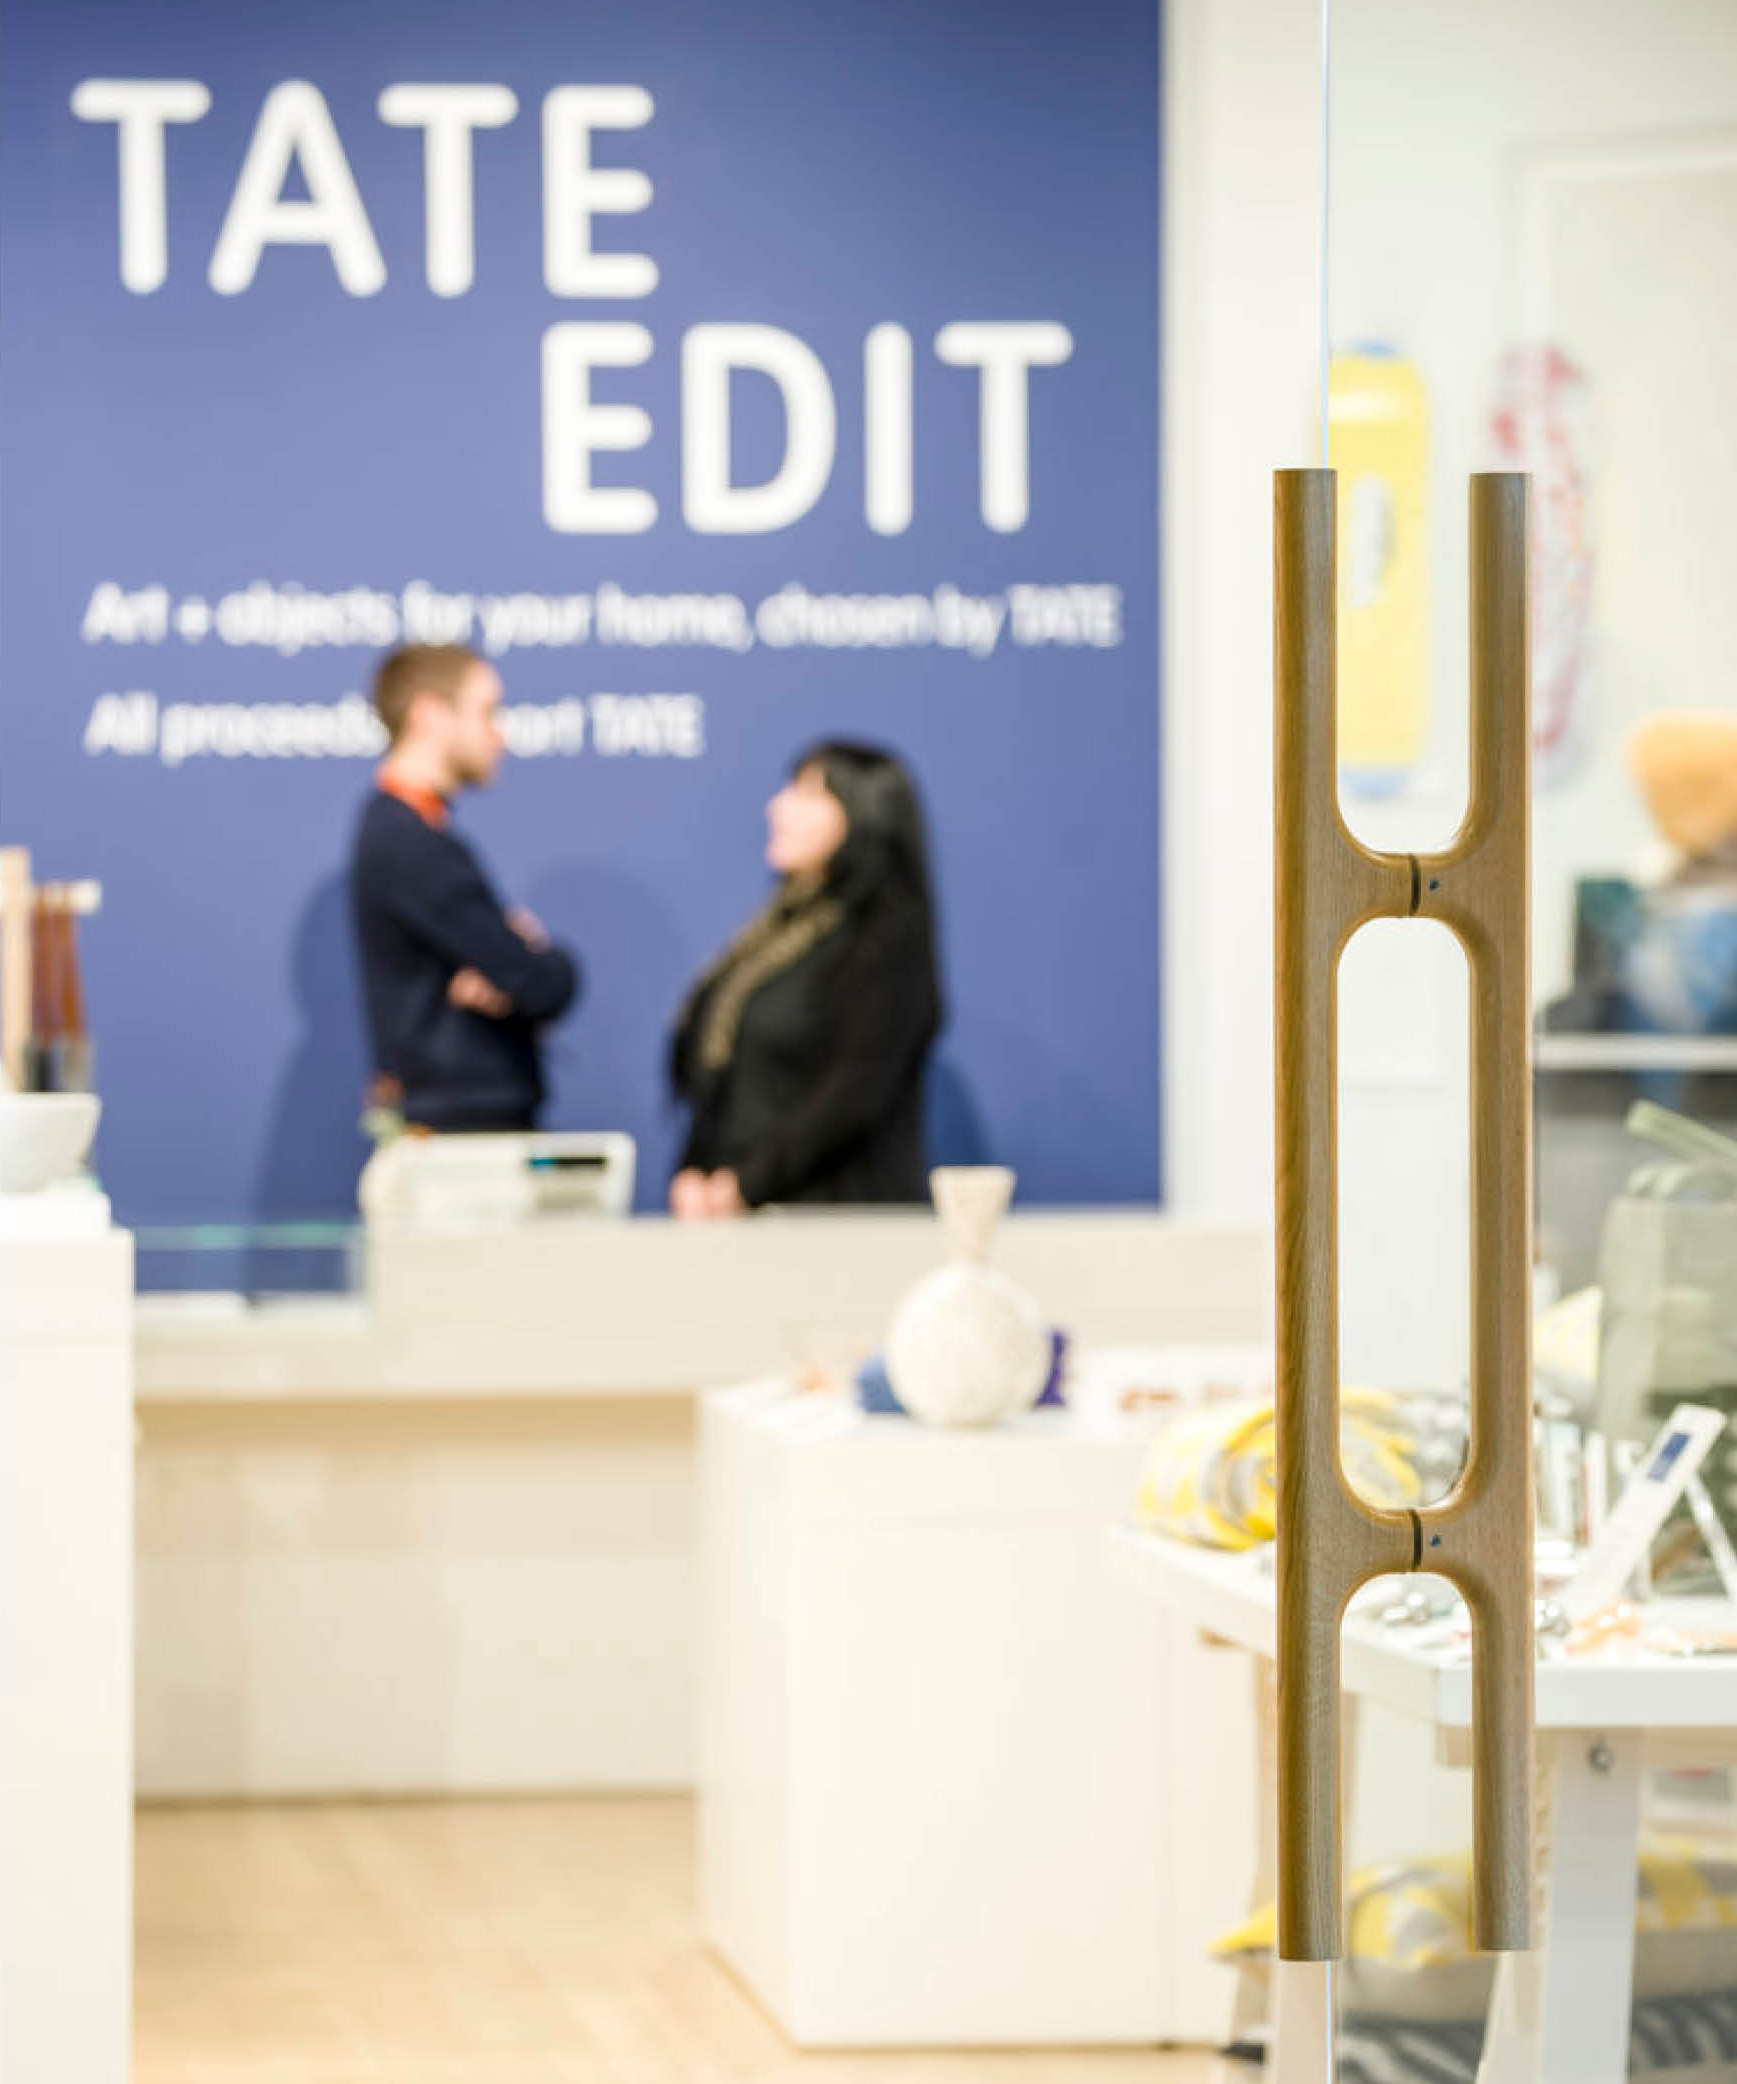 Holt Door Handles on Tate Edit